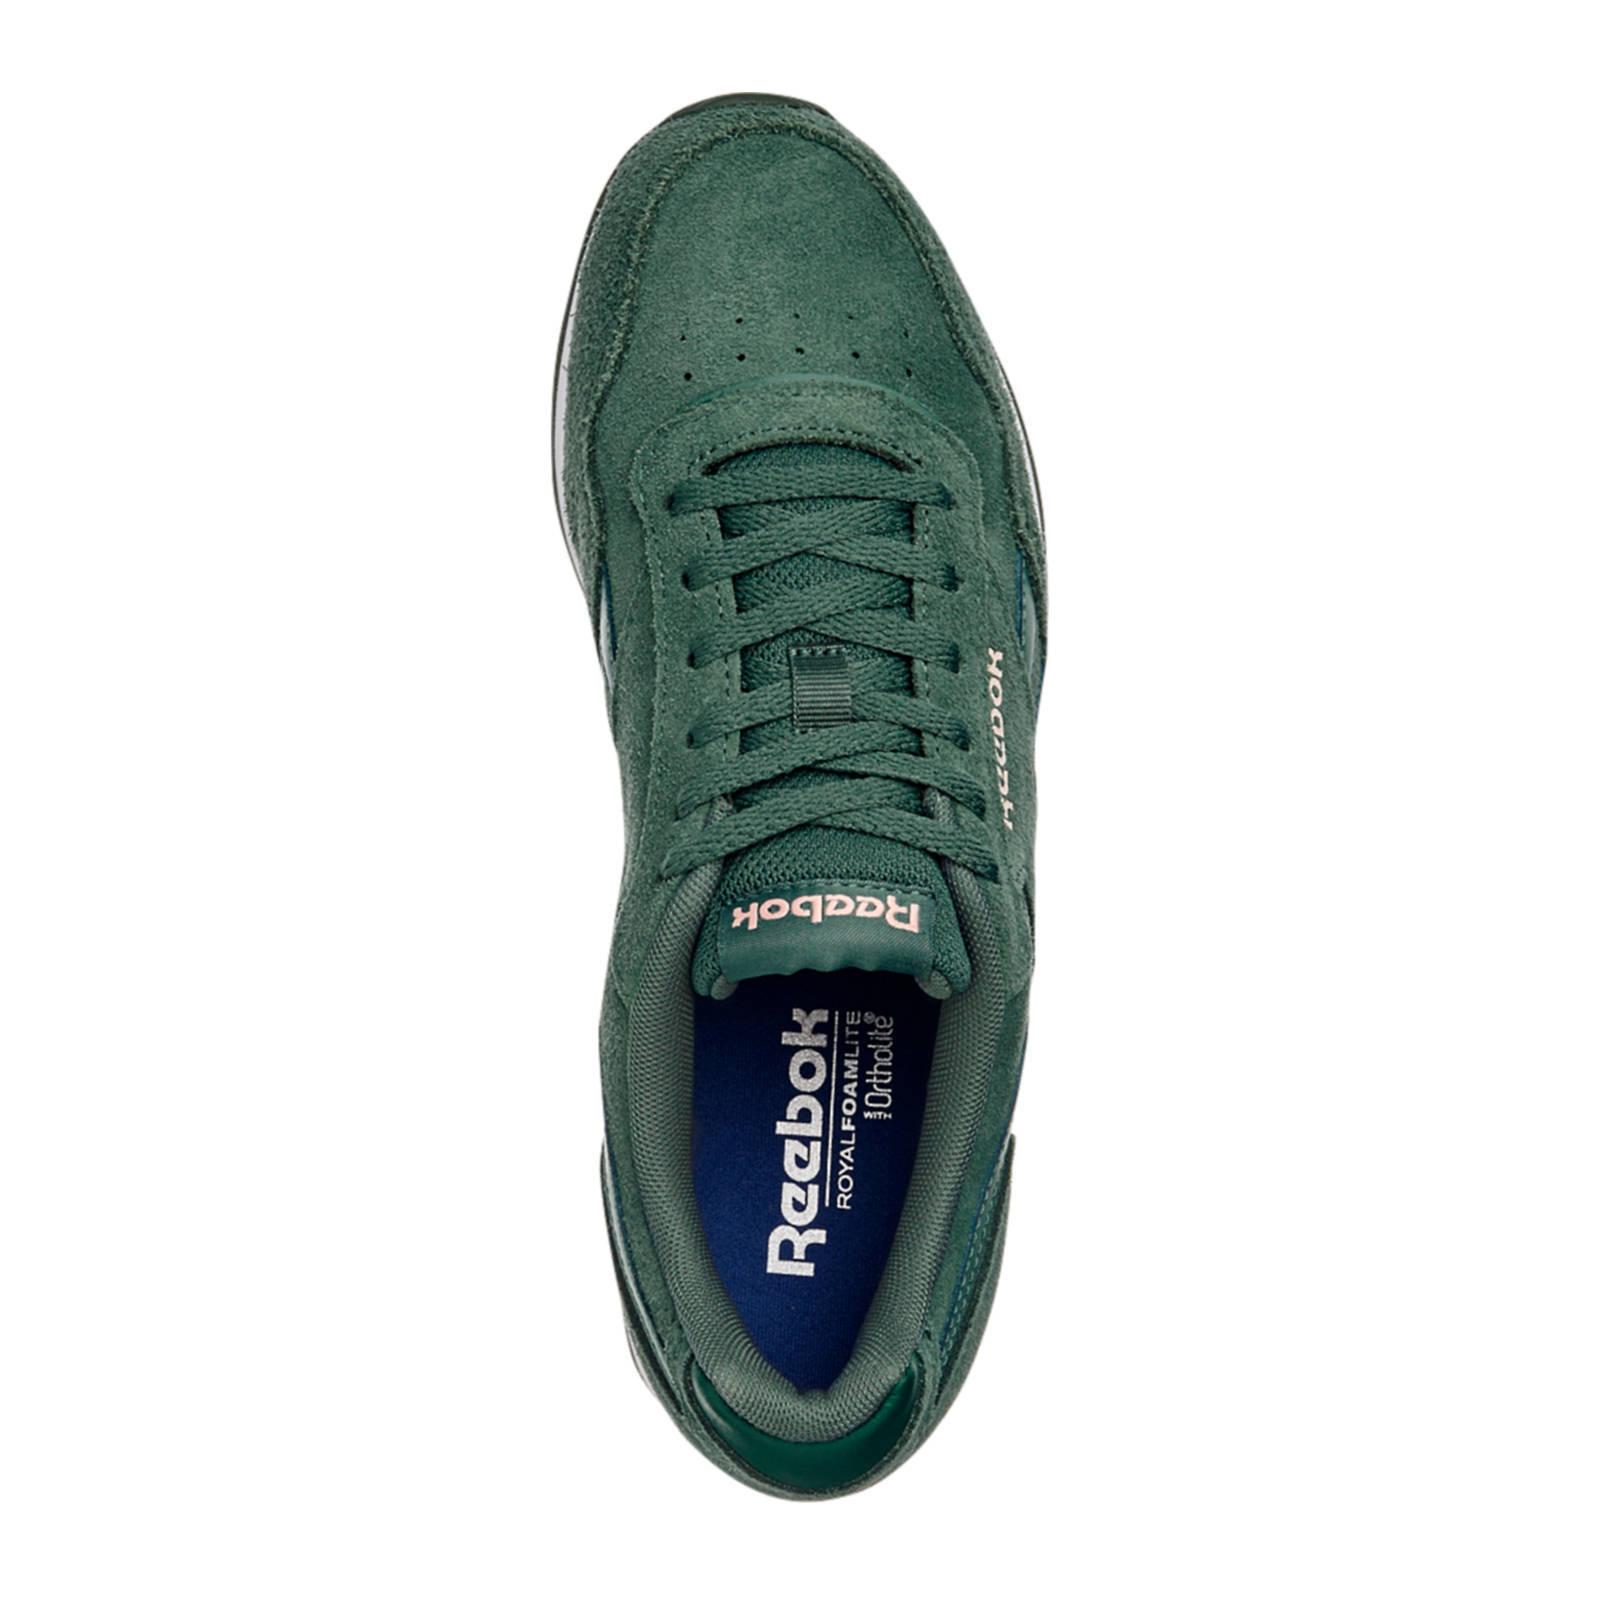 4f1db2c0b90 Reebok Royal Glide syède sneakers groen   wehkamp